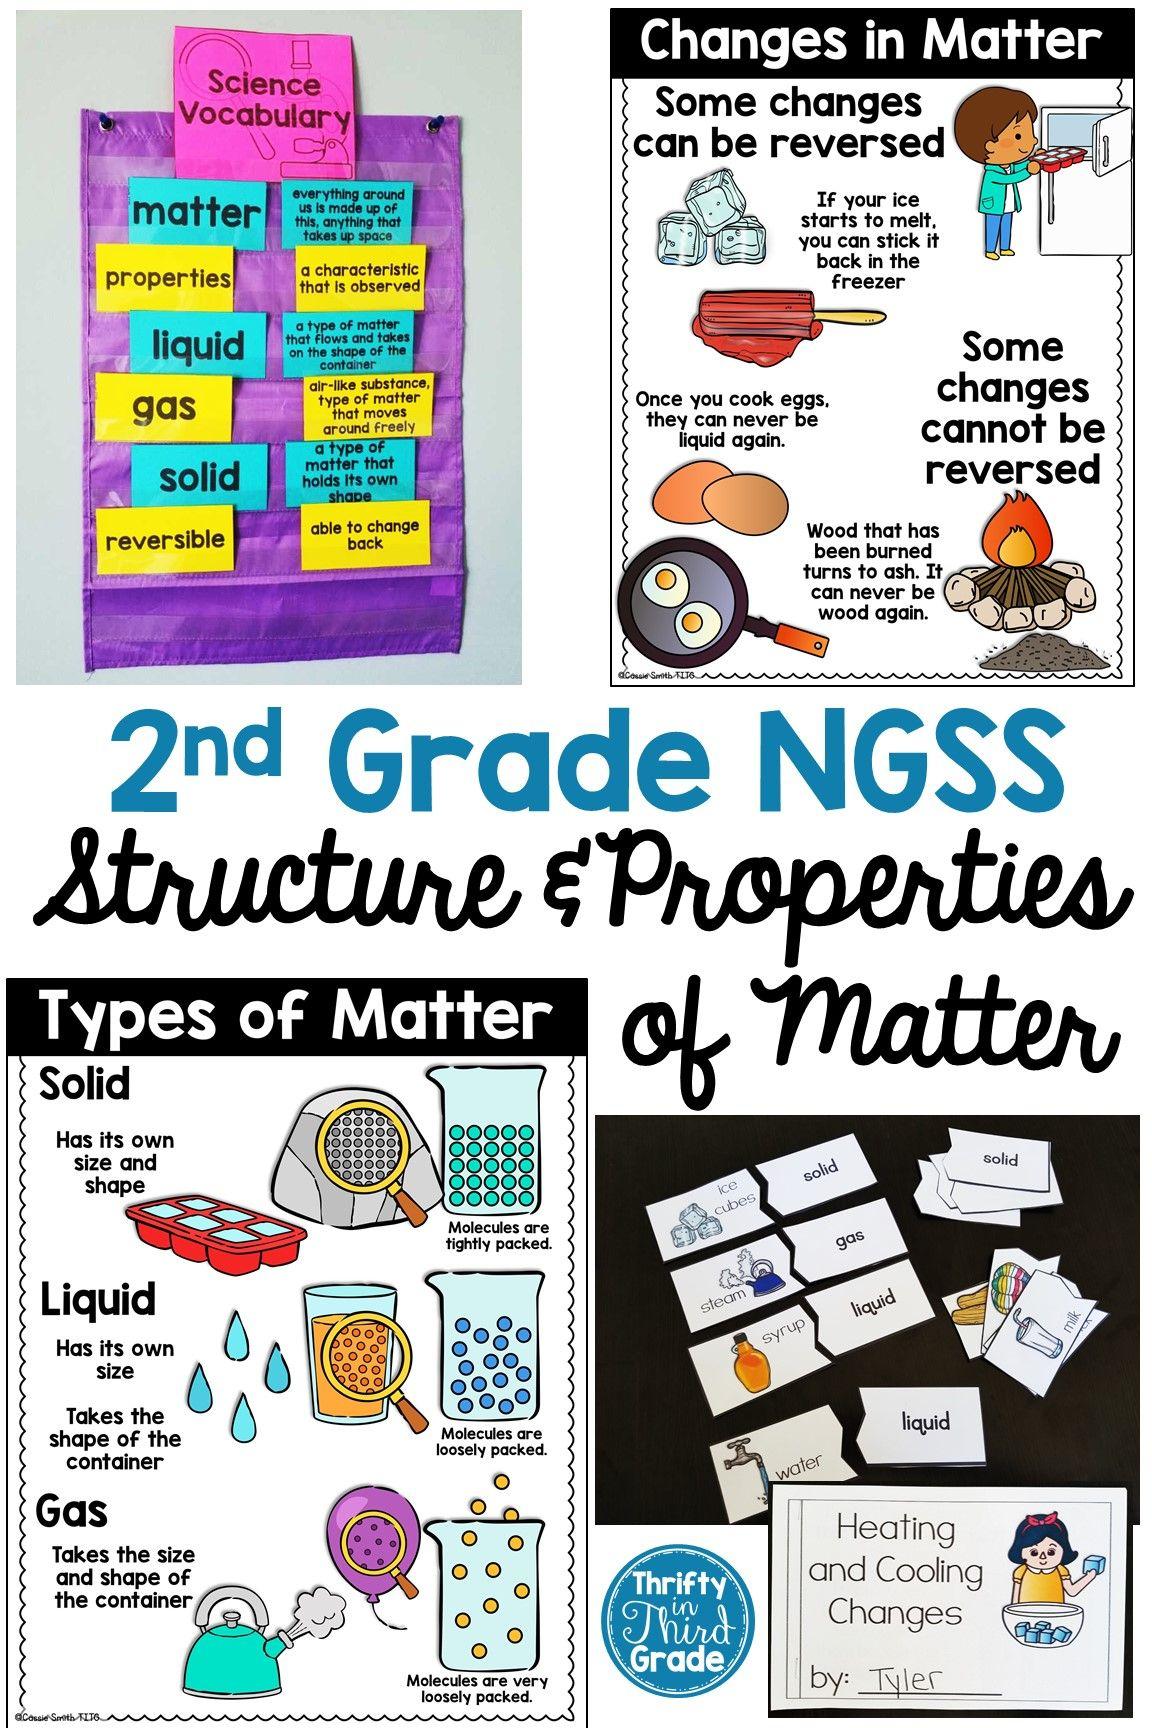 Building Blocks Of Matter Worksheet   Printable Worksheets and Activities  for Teachers [ 1728 x 1152 Pixel ]